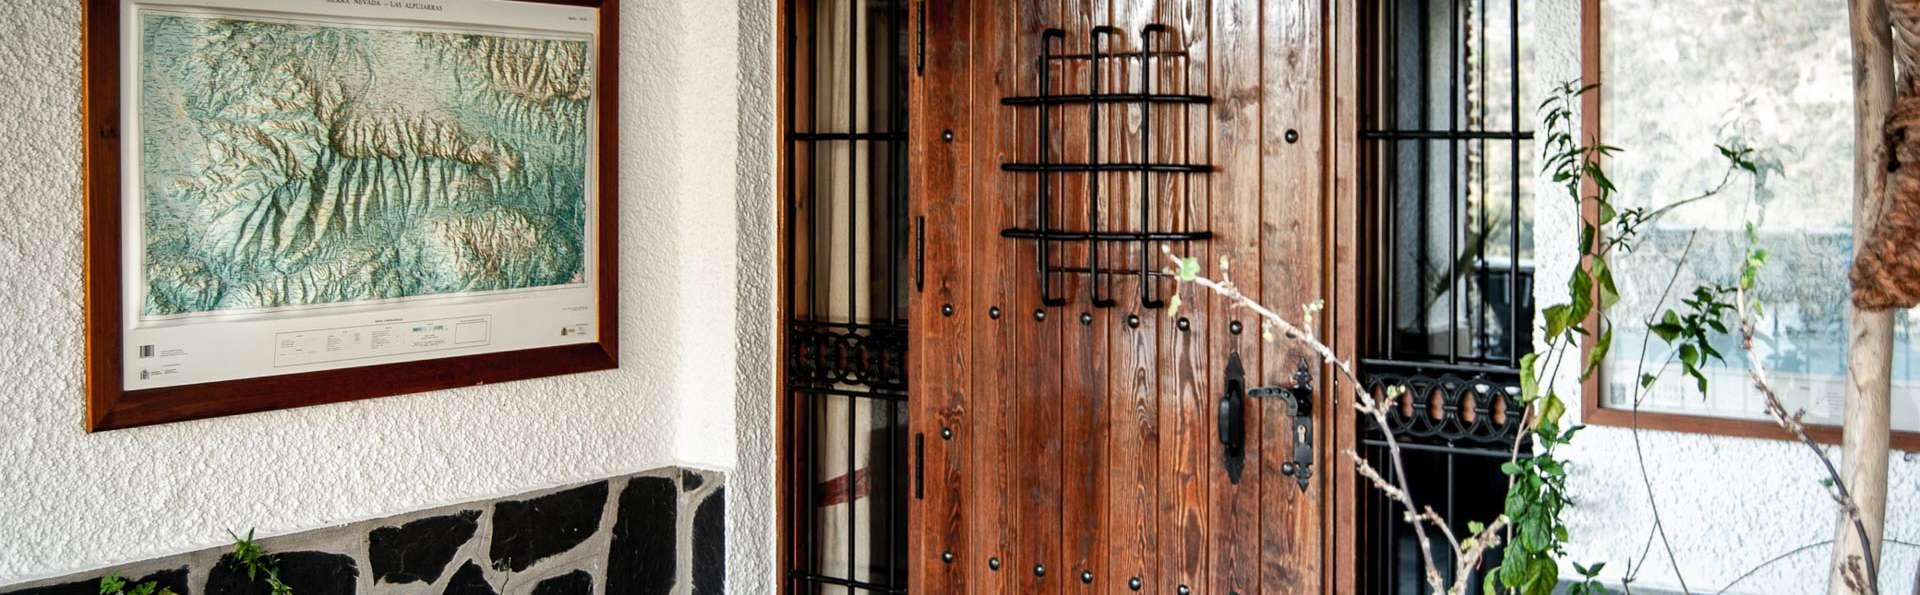 Hotel La Fragua II - EDIT_N2_FRONT_03.jpg